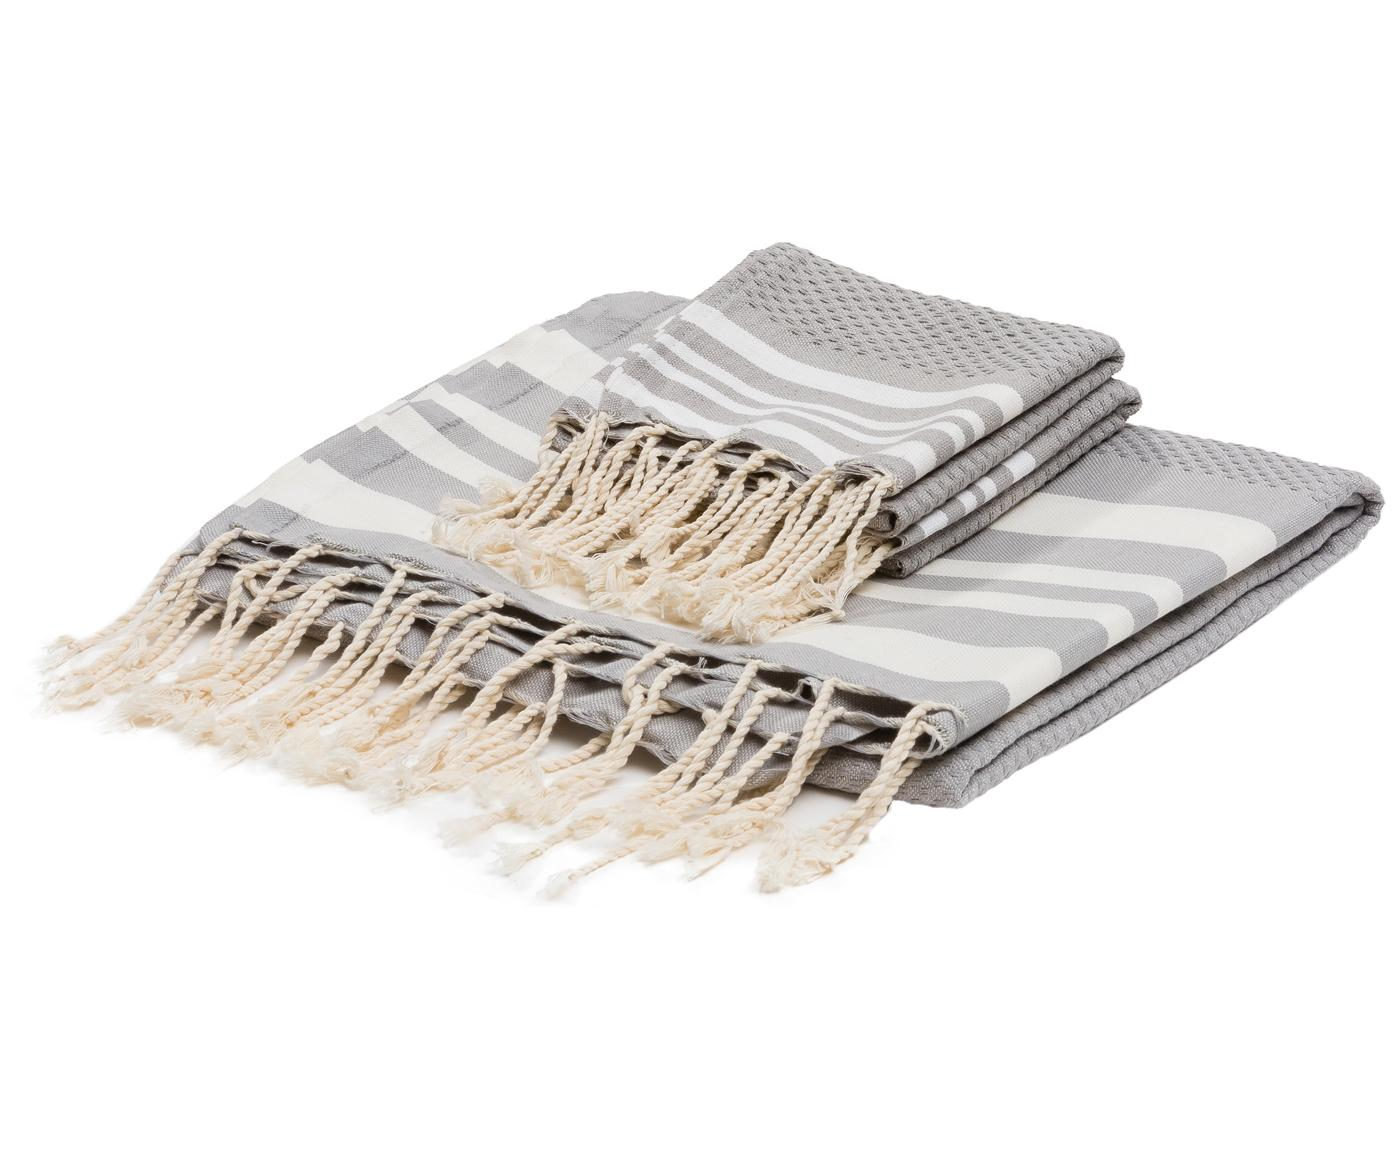 Set de toallas Hamptons, 3pzas., 100%algodón Gramaje ligero 200g/m², Gris perla, blanco, Tamaños diferentes